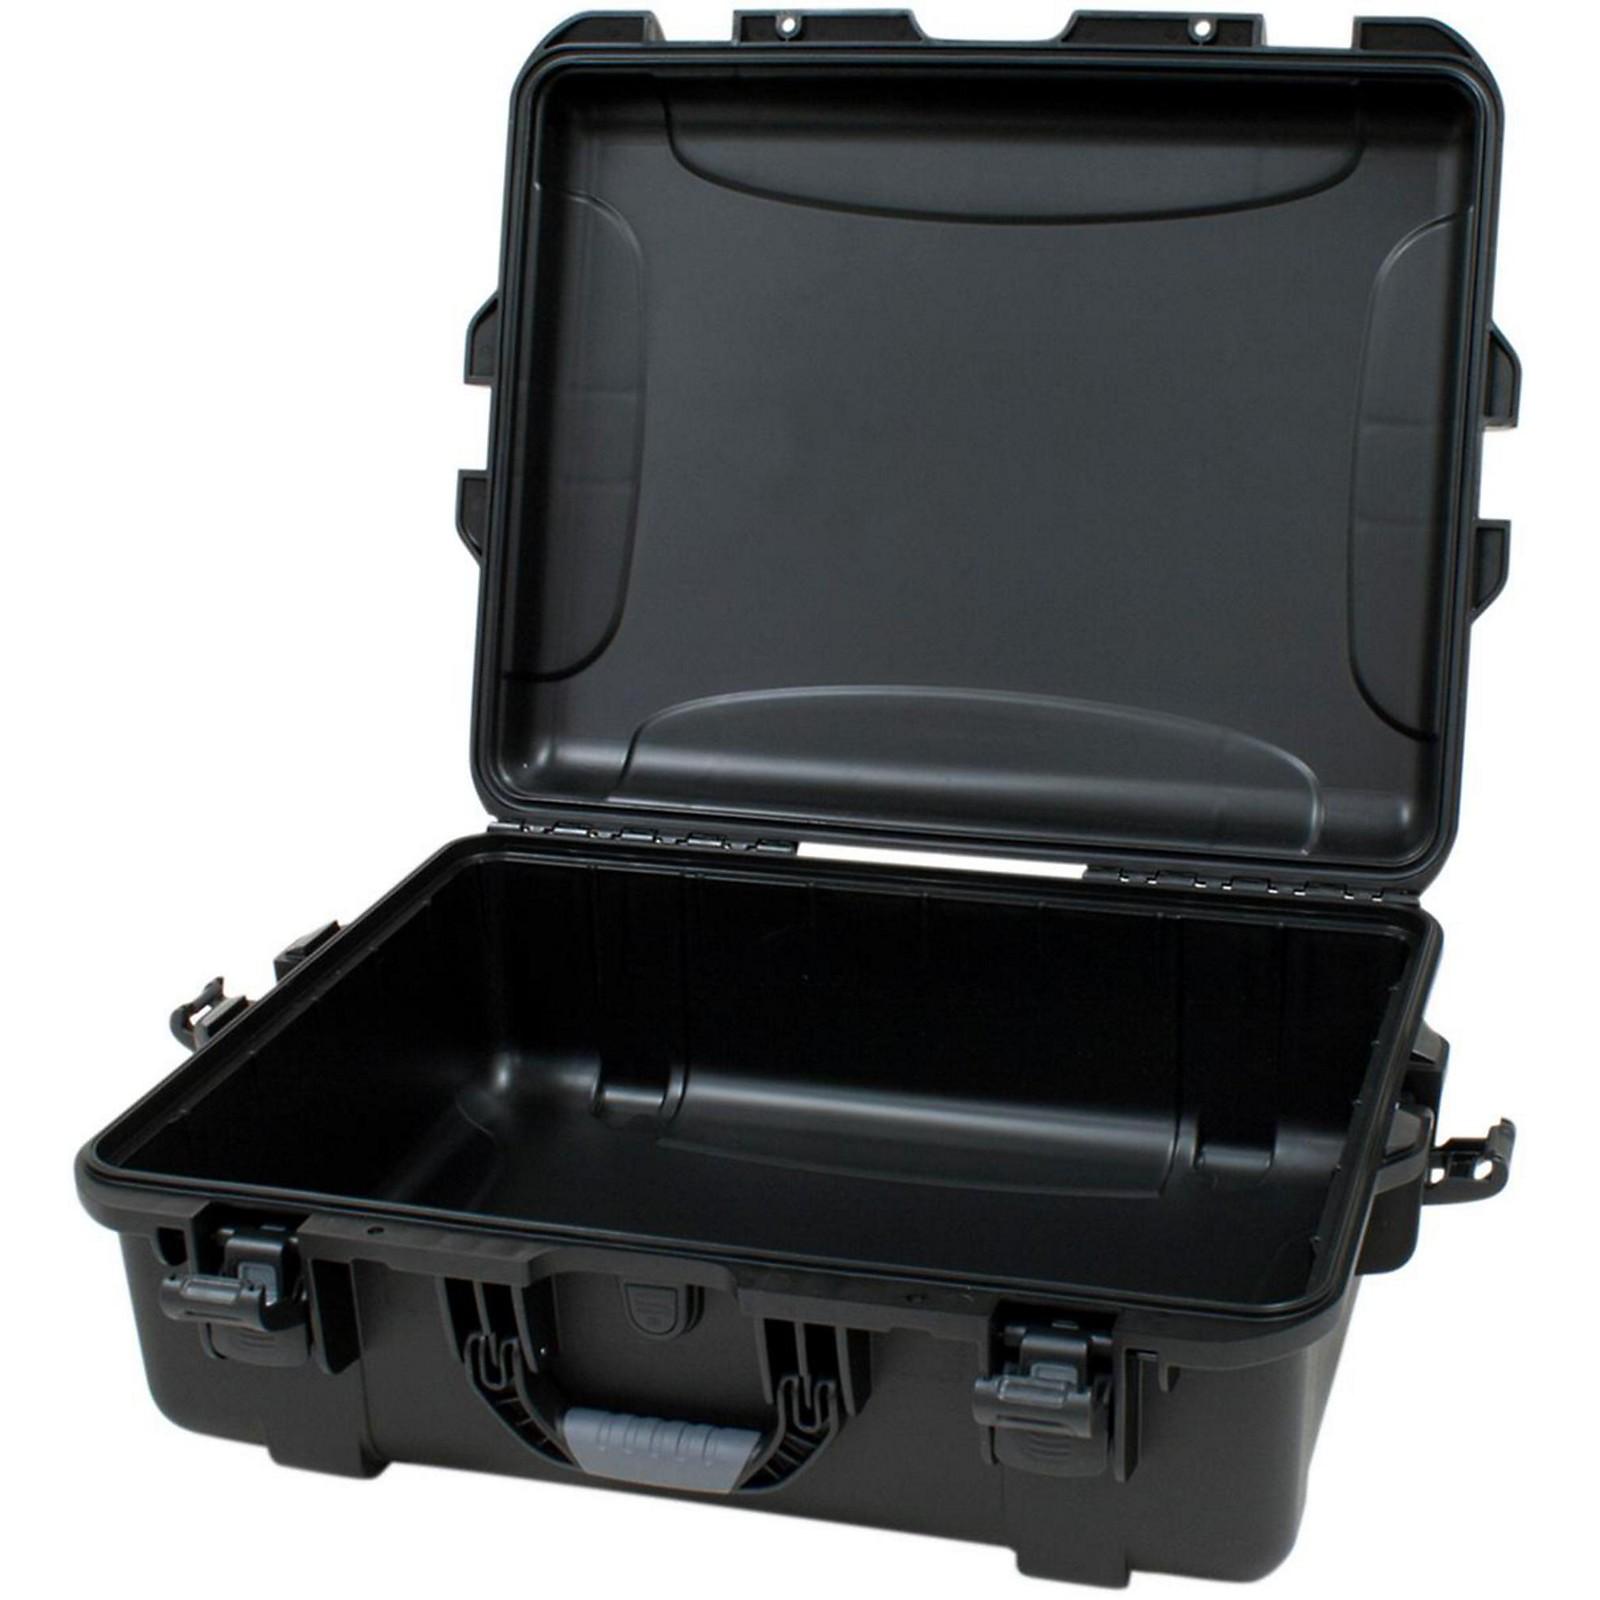 Gator GU-2217-08-WPNF Waterproof Injection Molded Case